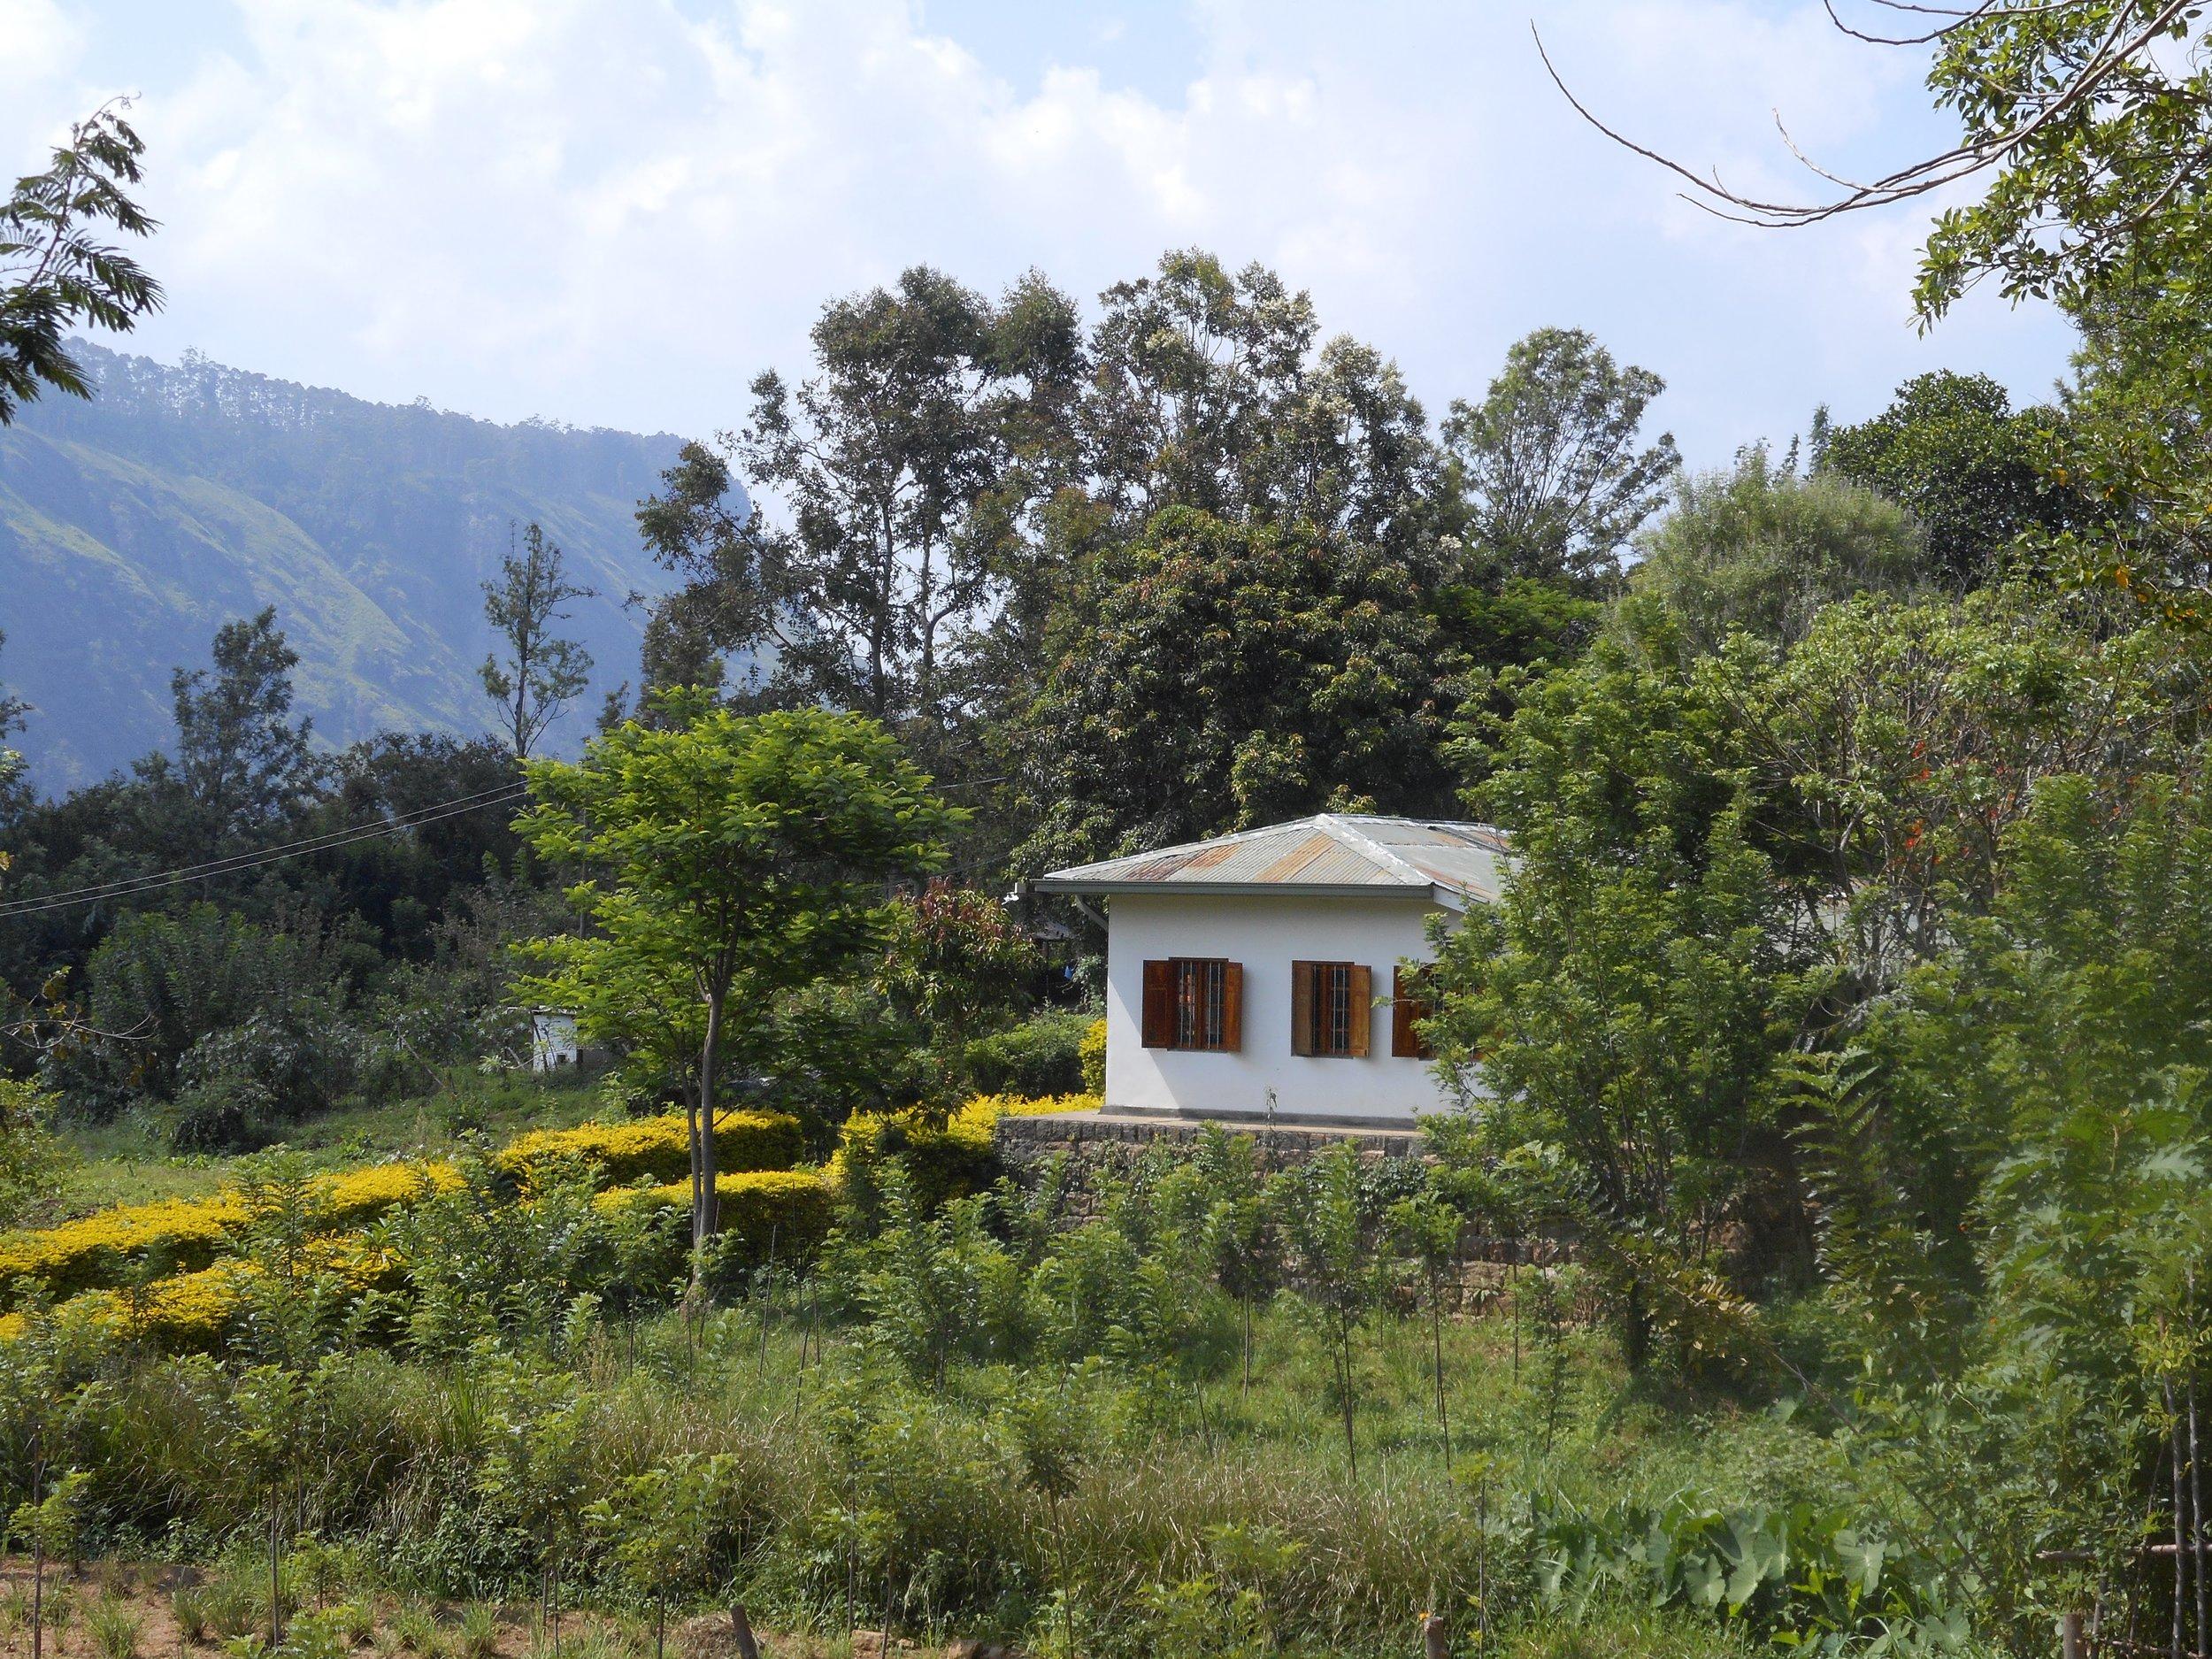 Amba Estate Sri Lanka, the location of Wilderness Journeys retreat weeks